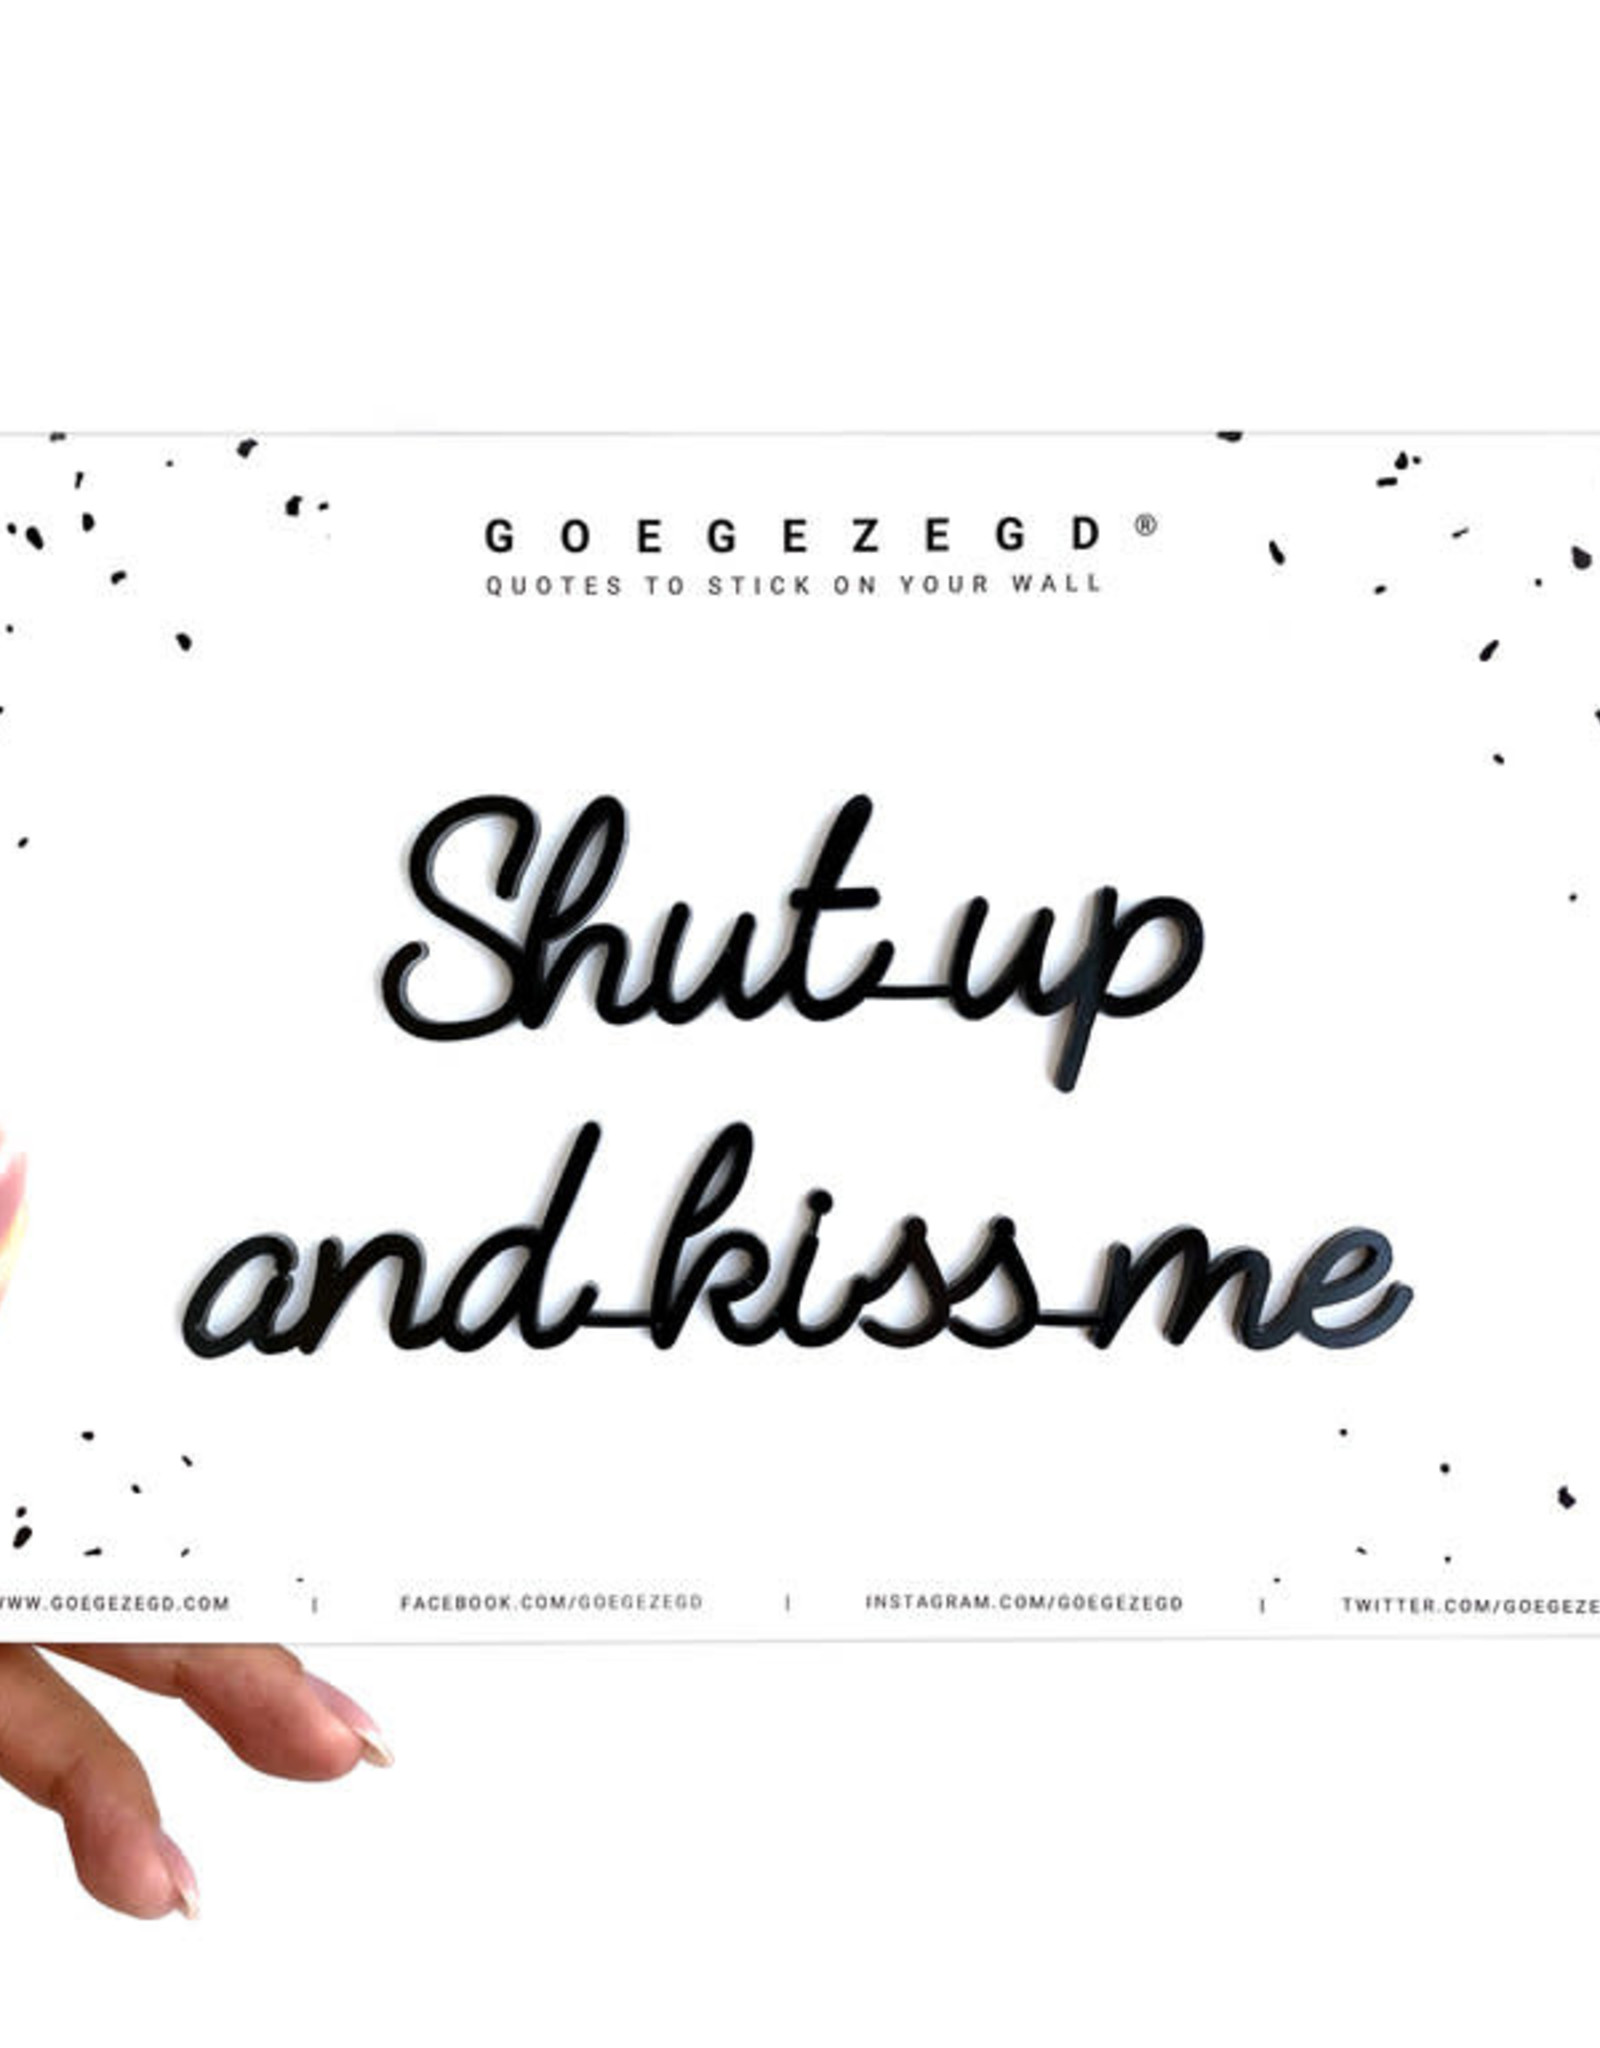 Goegezegd Goegezegd - Shut up and kiss me